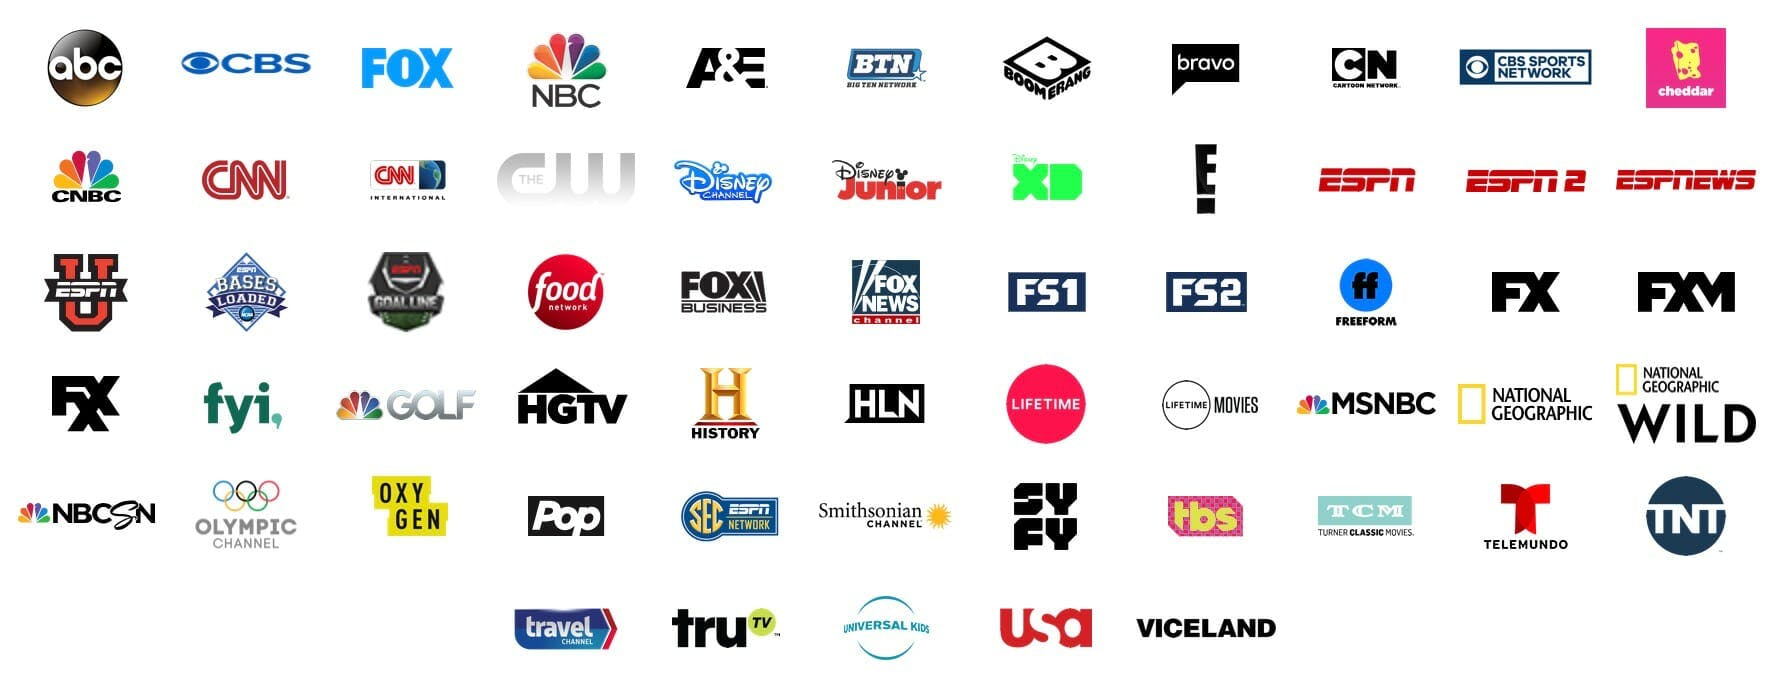 arsenal vs spurs live stream hulu with live tv